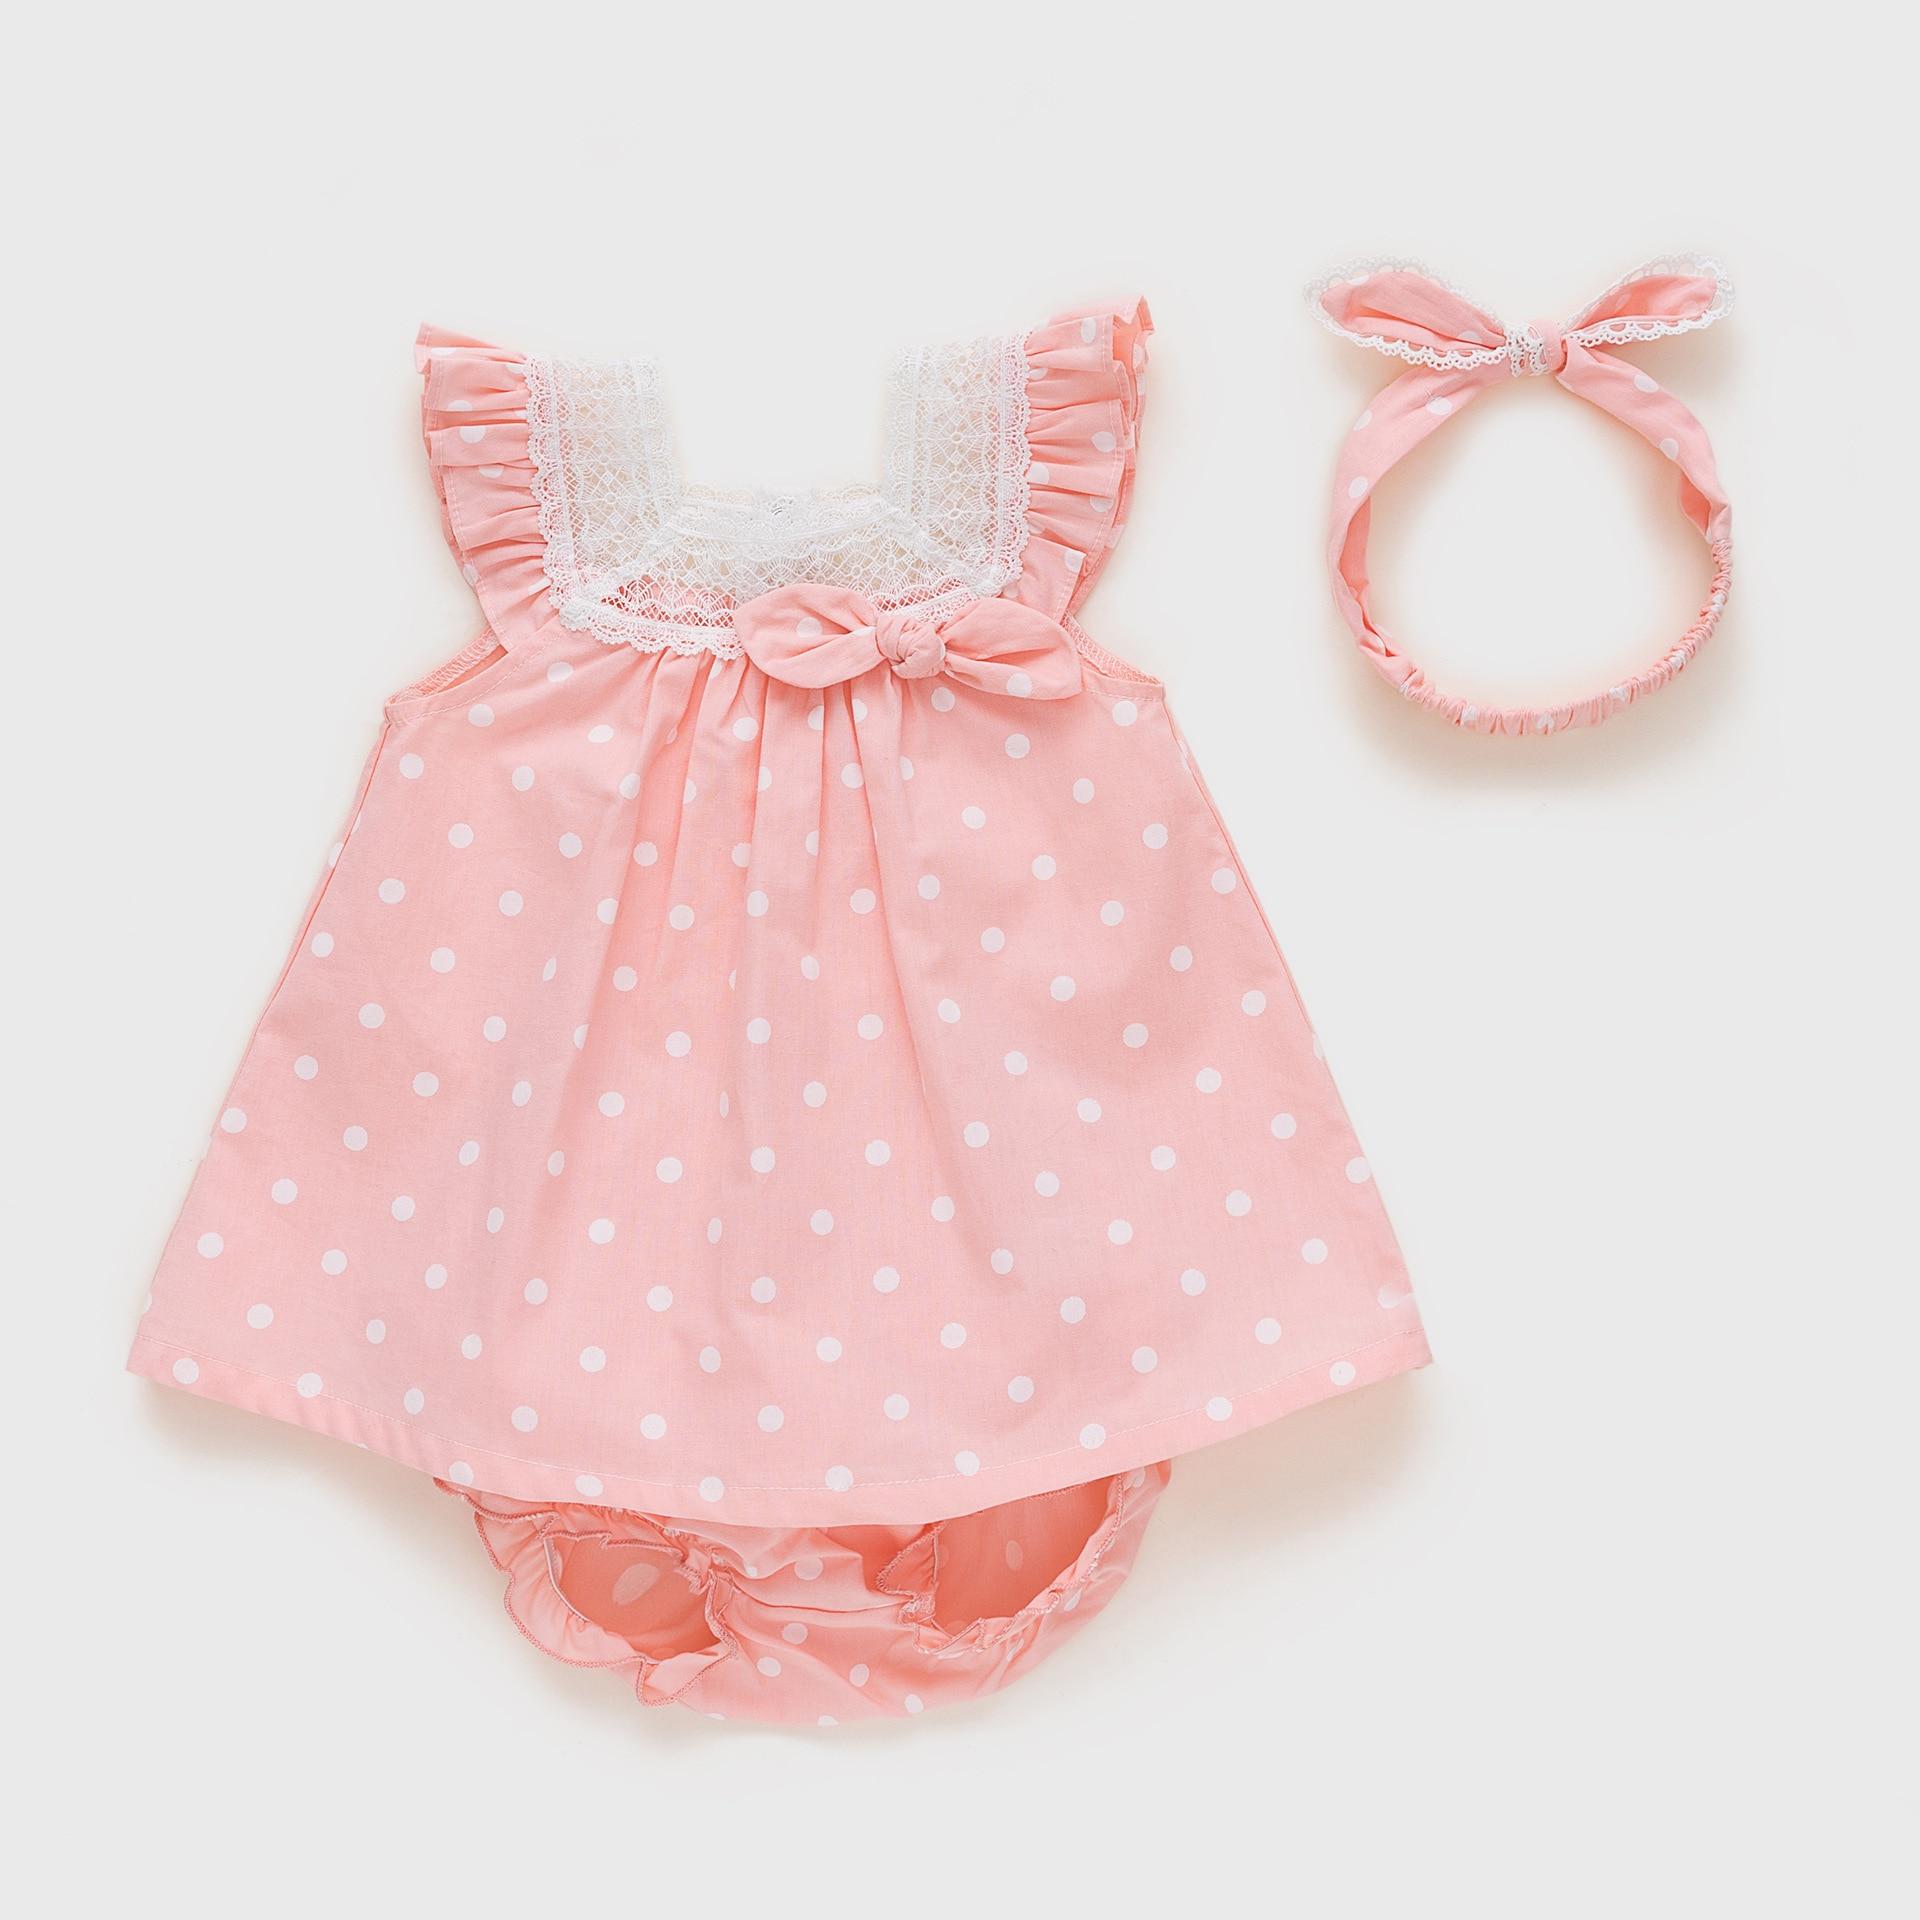 Vlinder Baby Girl dress baby clothes Baby Birthday dresses Cute Bow Tie Dress set  Newborn Short Sleeves Infant Dresses 3pcs set